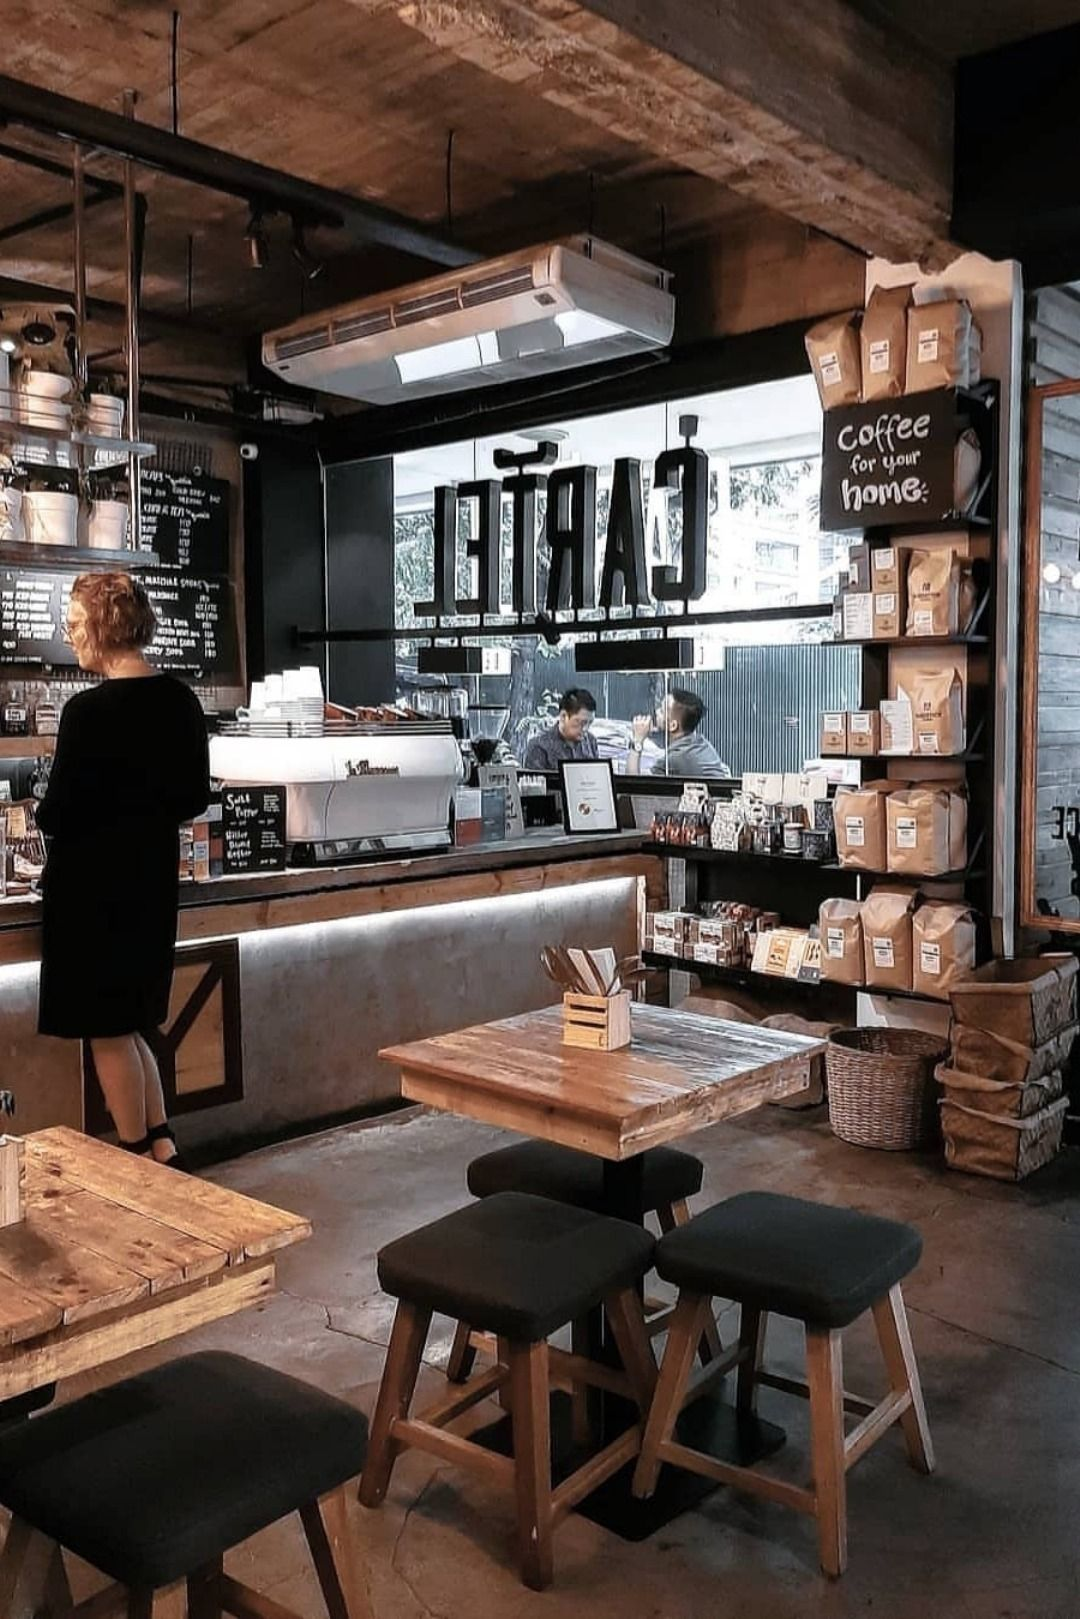 30 Stunning Coffee Shop Design Ideas That Most Inspiring In 2020 Coffee House Interiors Coffee Shop Decor Coffee Shop Design